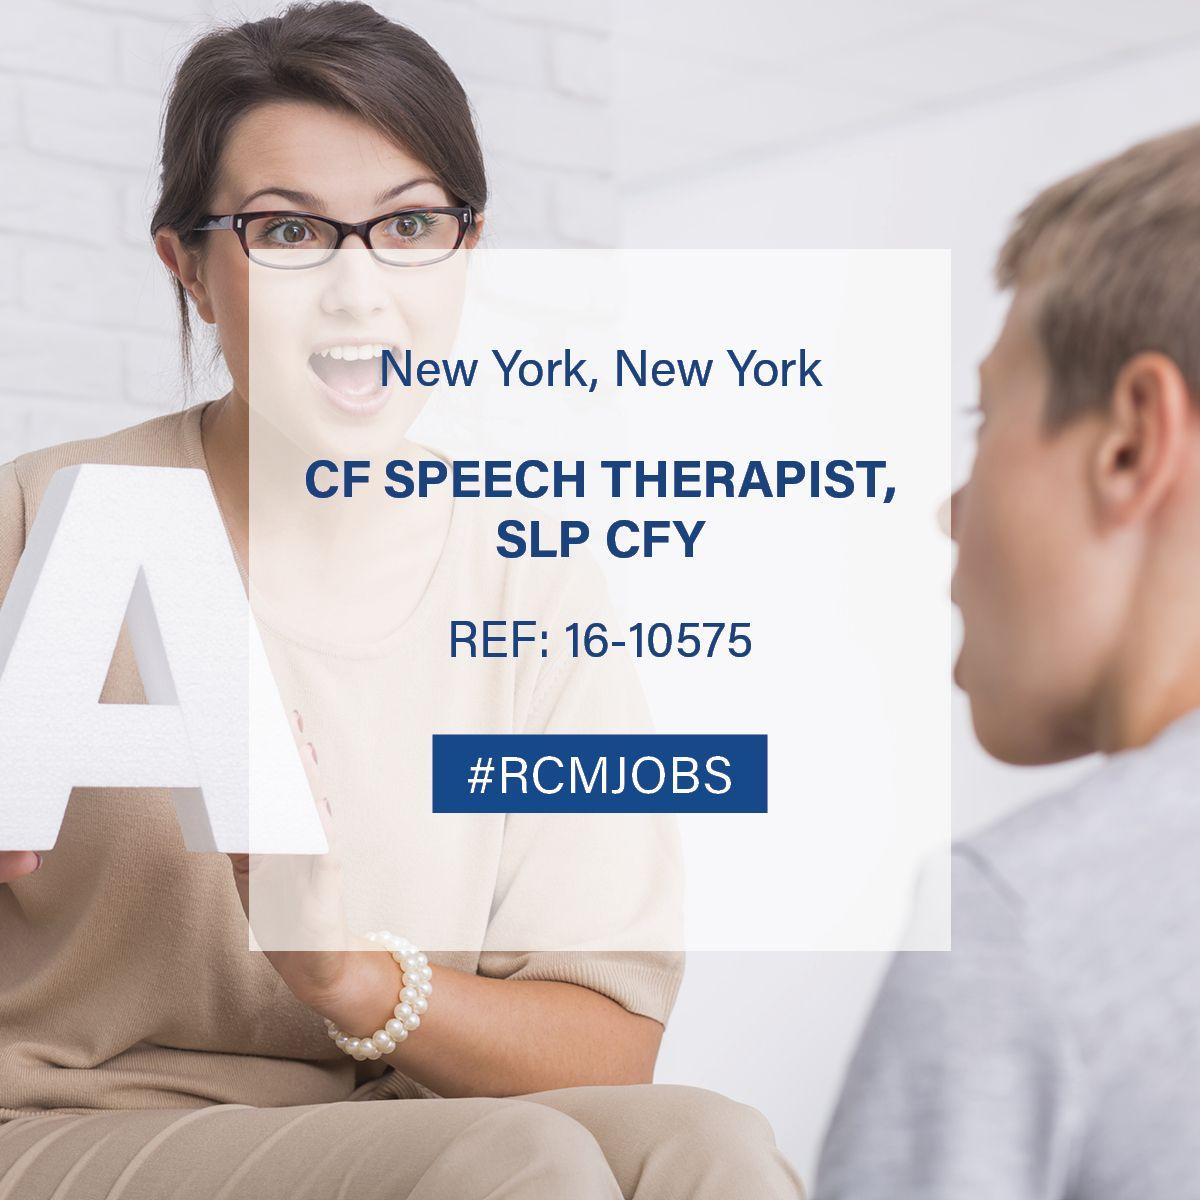 #jobsearch #rcmjobs #jobs #clinicaljobs #cfspeechtherapist #speechtherapist #slp #cfy #therapist #hospital #newyorkcity #newyork #careeradvice #clinicalcareer #careers #jobopportunity #clinicaljobsearch